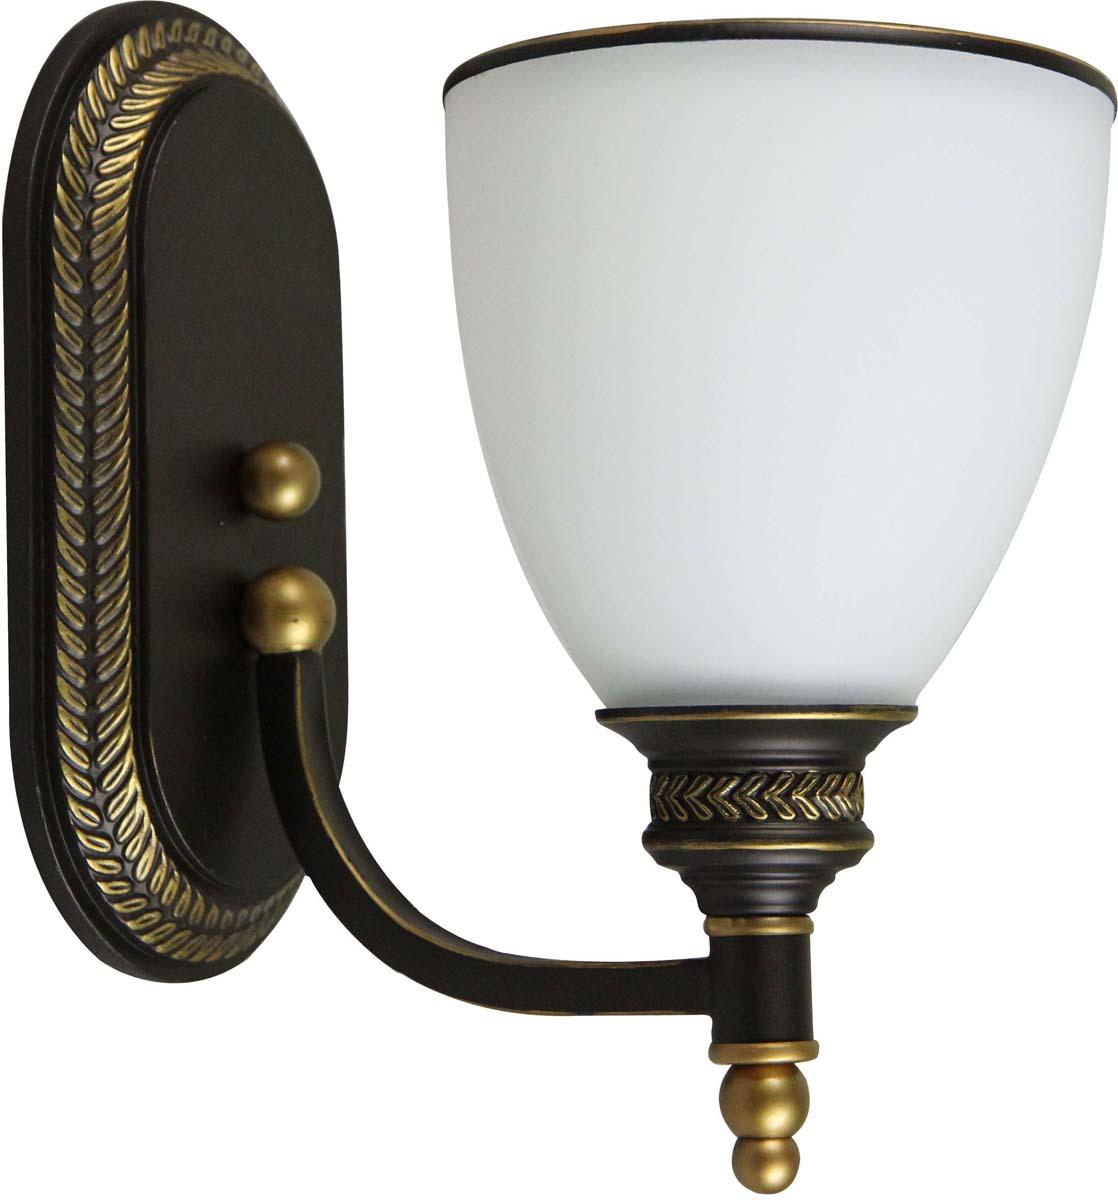 Светильник настенный Arte Lamp Bonito, 1 х E27, 40 W. A9518AP-1BA arte lamp подвесной светильник arte lamp bonito a9518sp 3ba